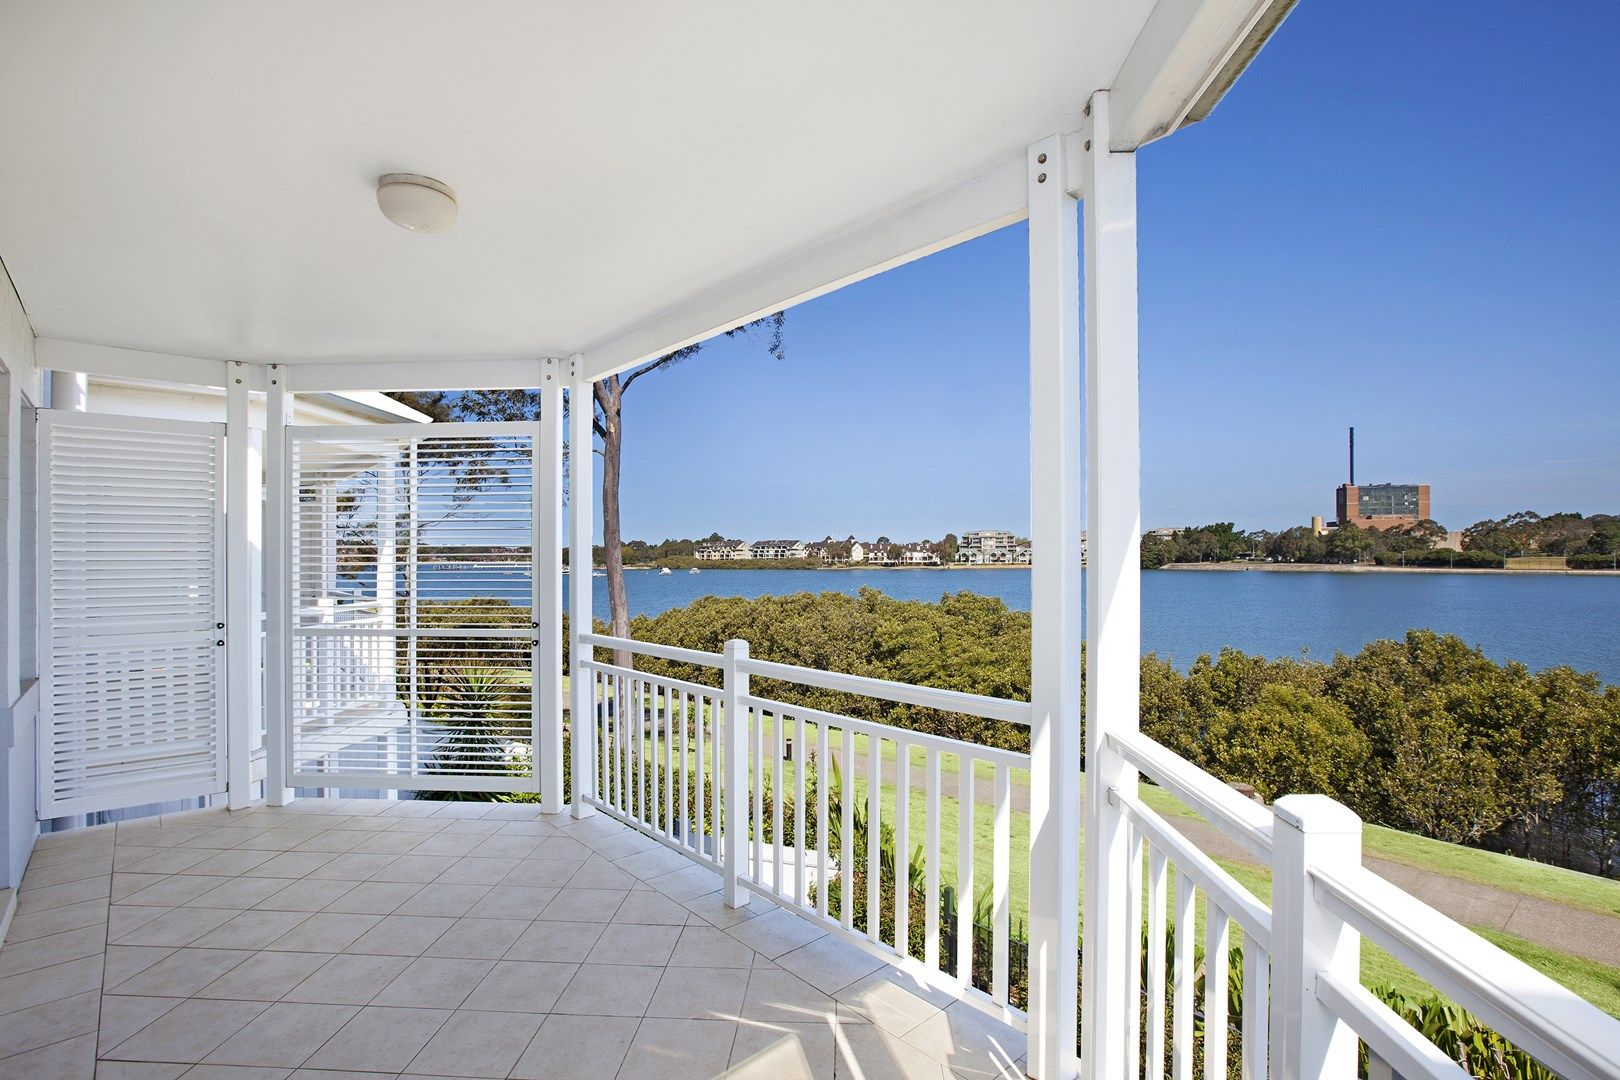 16 Jacaranda Drive, Cabarita NSW 2137, Image 0